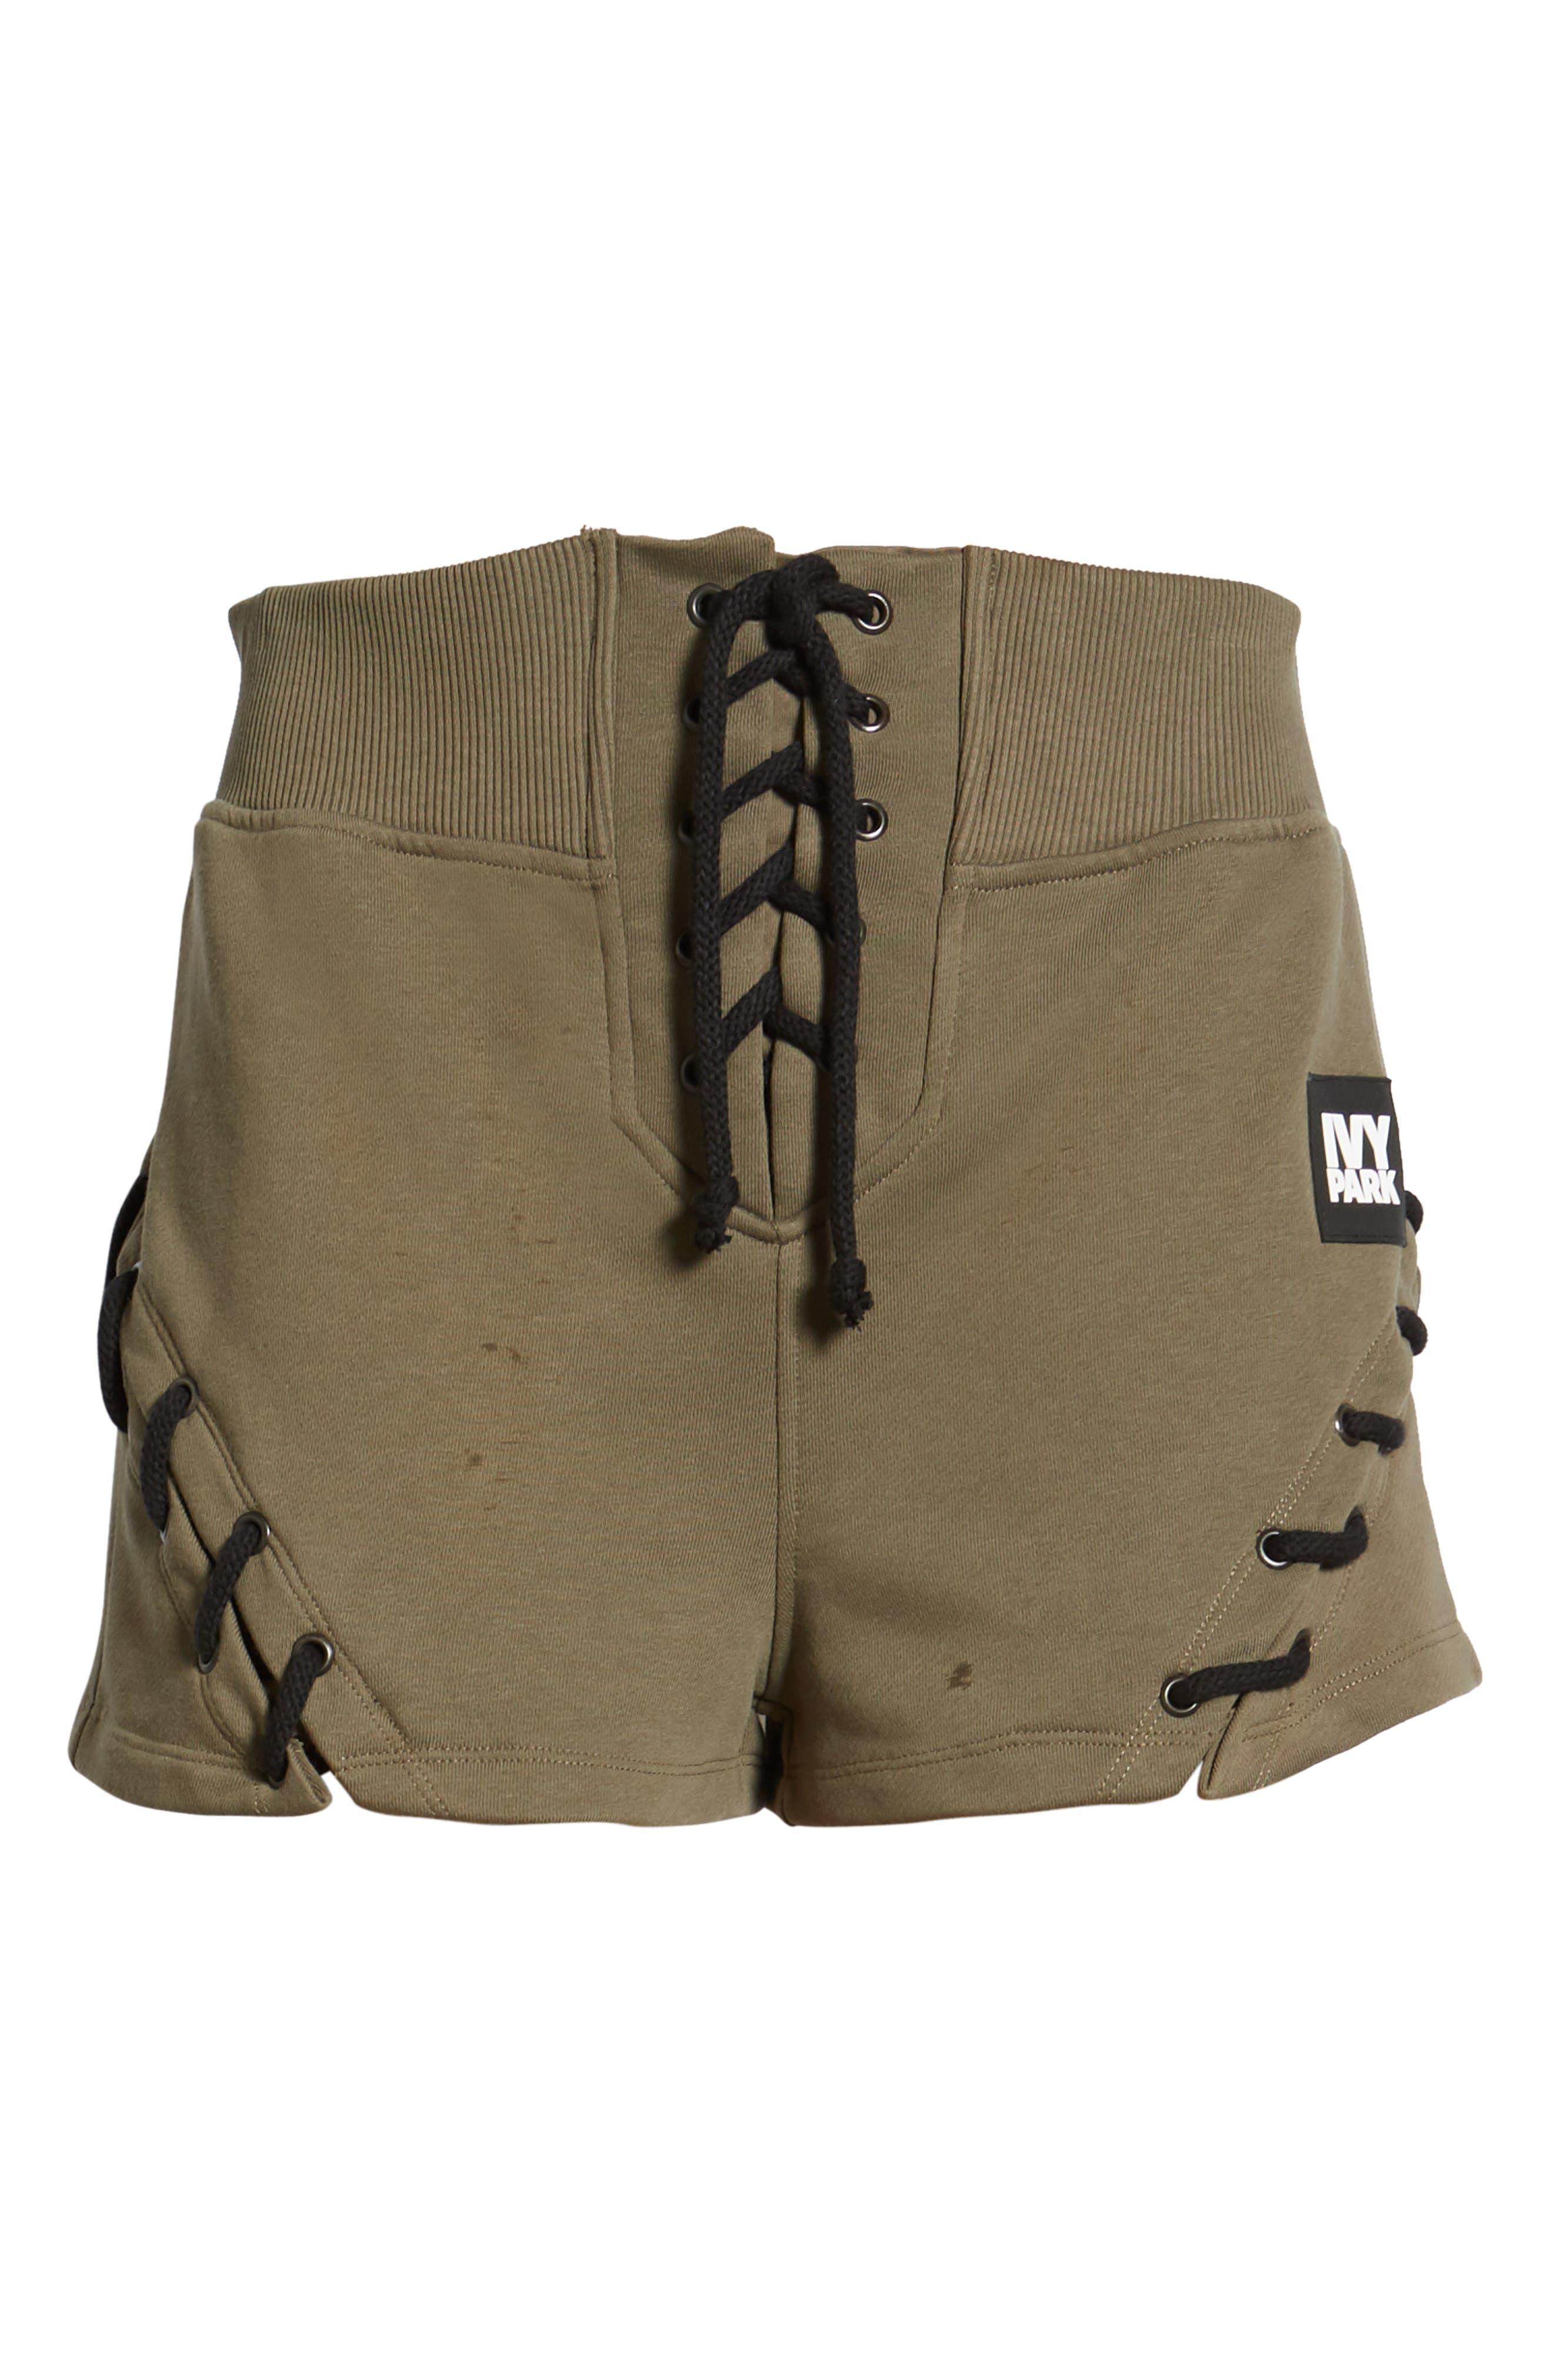 Craft Shorts,                             Alternate thumbnail 7, color,                             CROCODILE